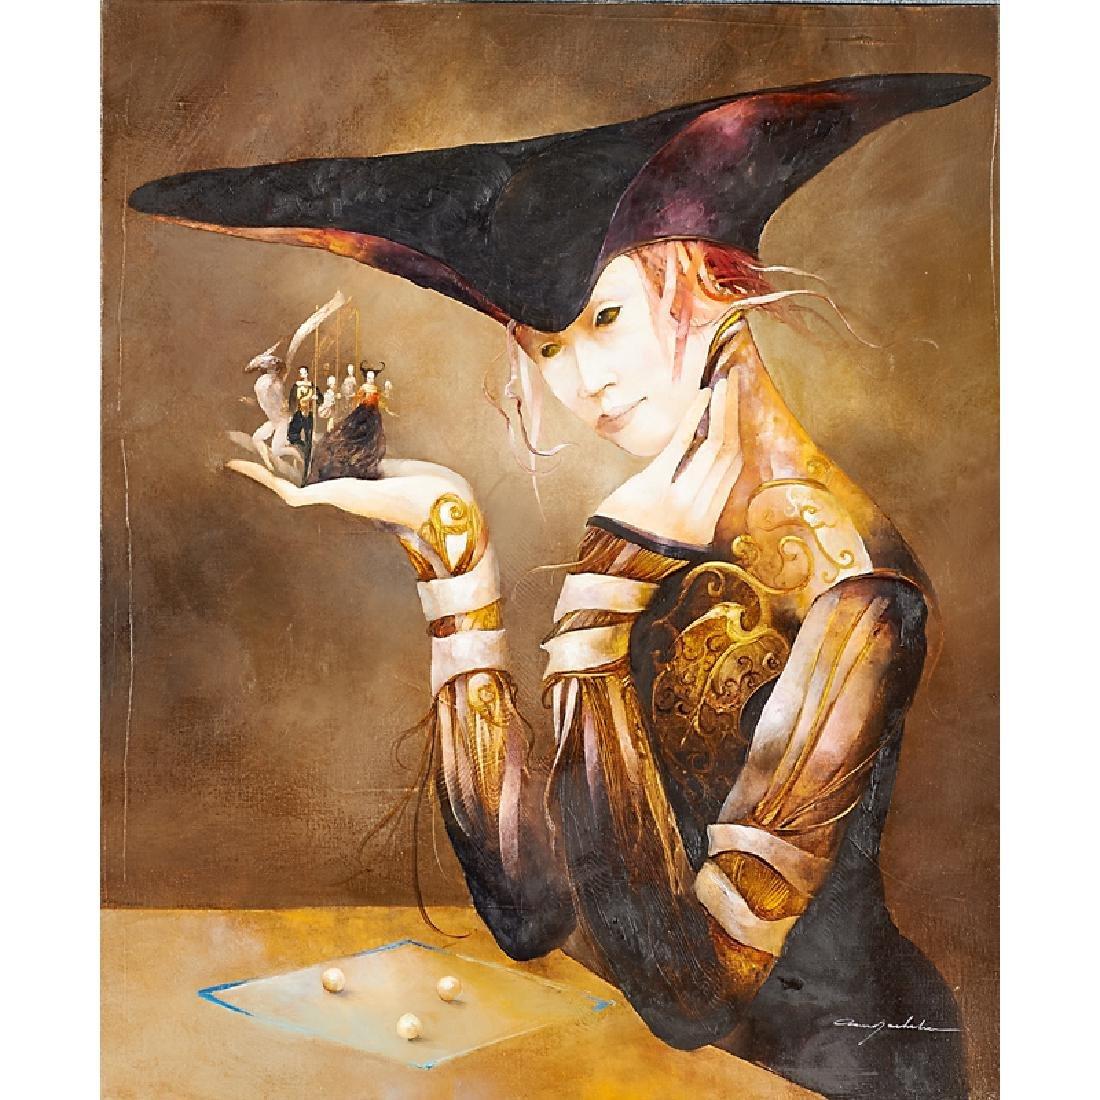 ANNE BACHELIER (French, b. 1949)